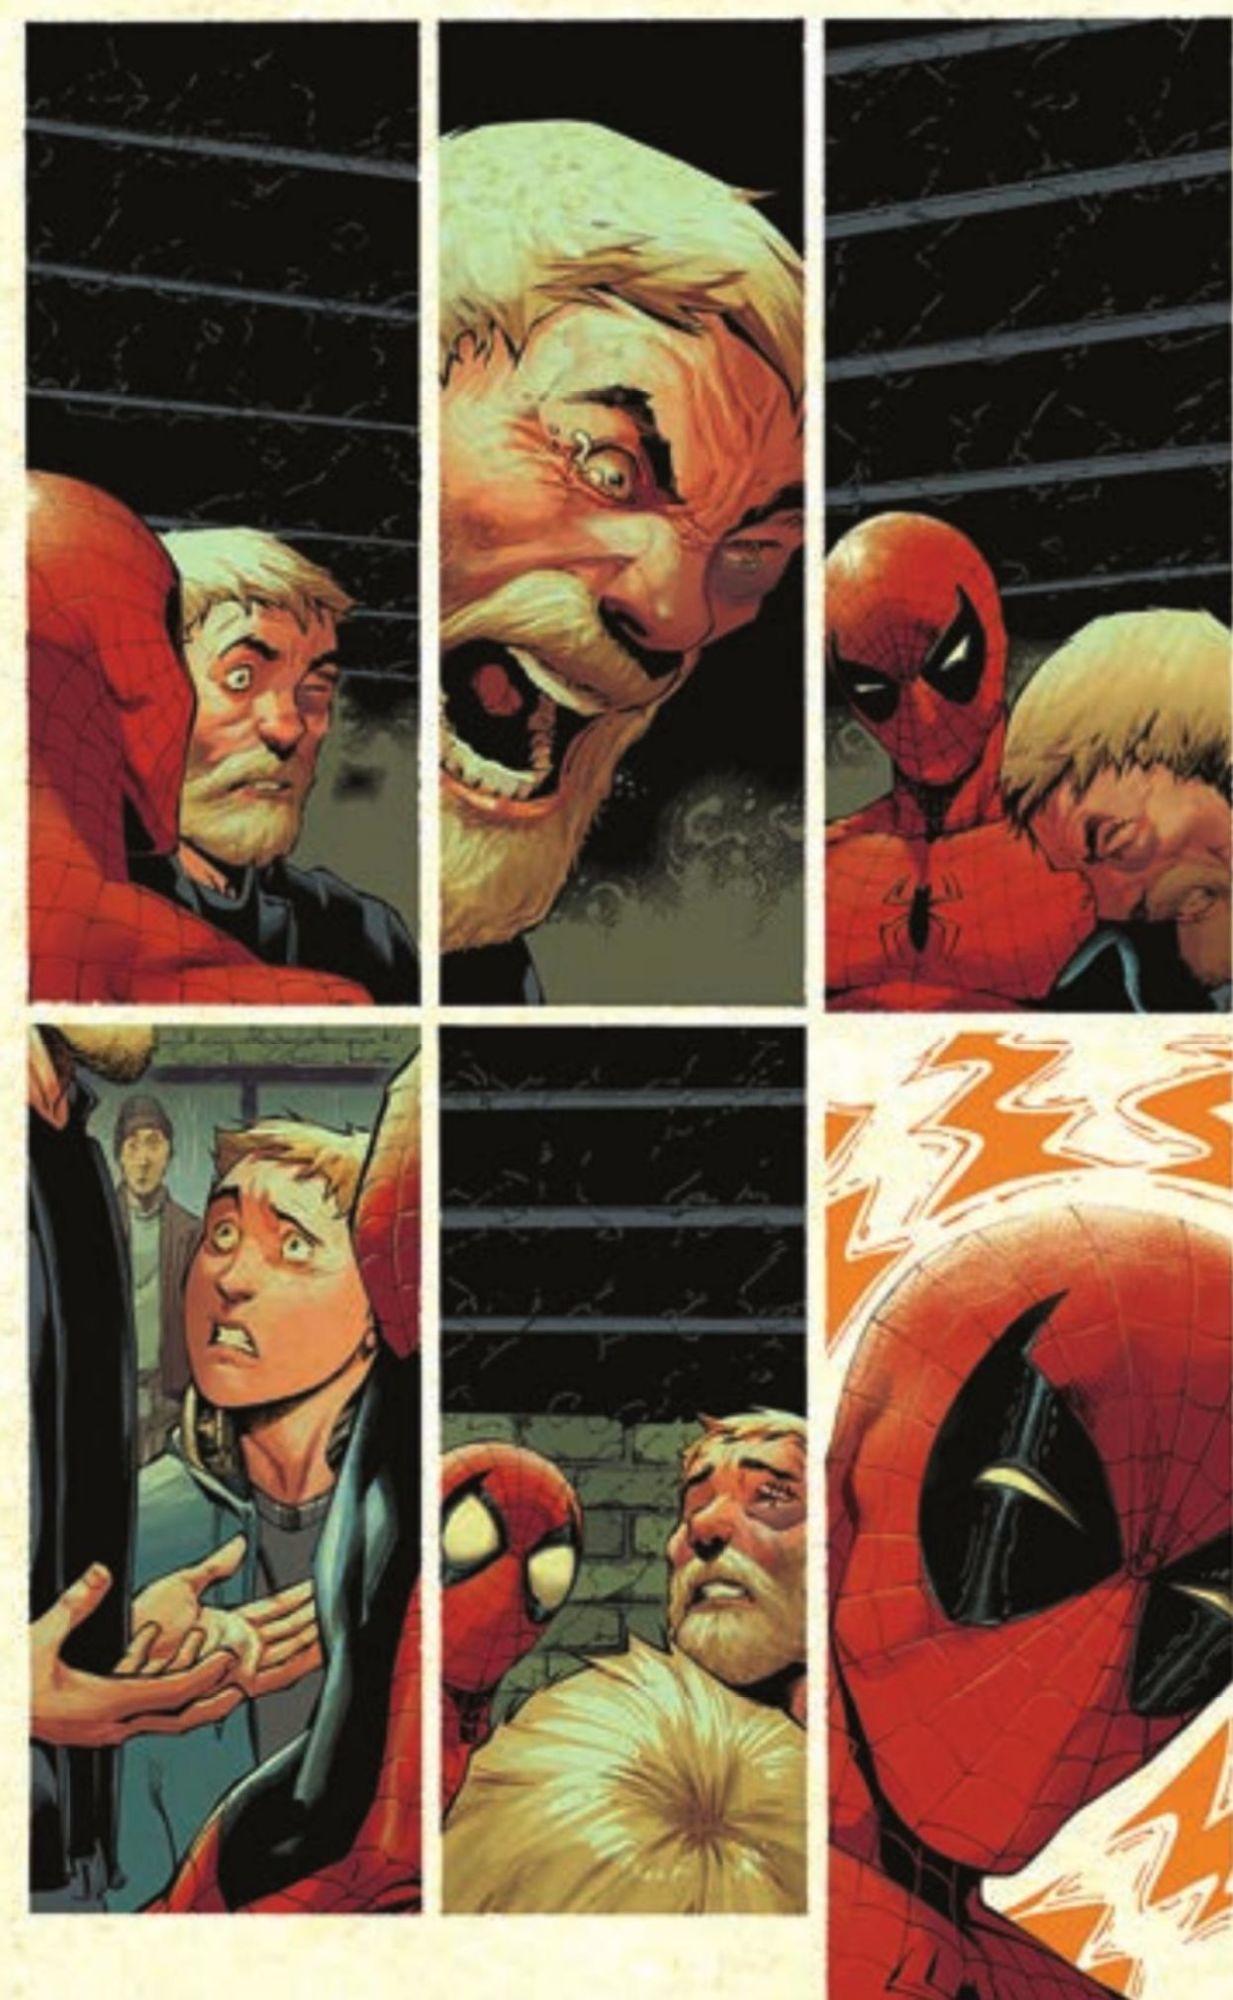 Will Absolute Carnage Make Deadpool's Secret Secret Wars #1 Canon?